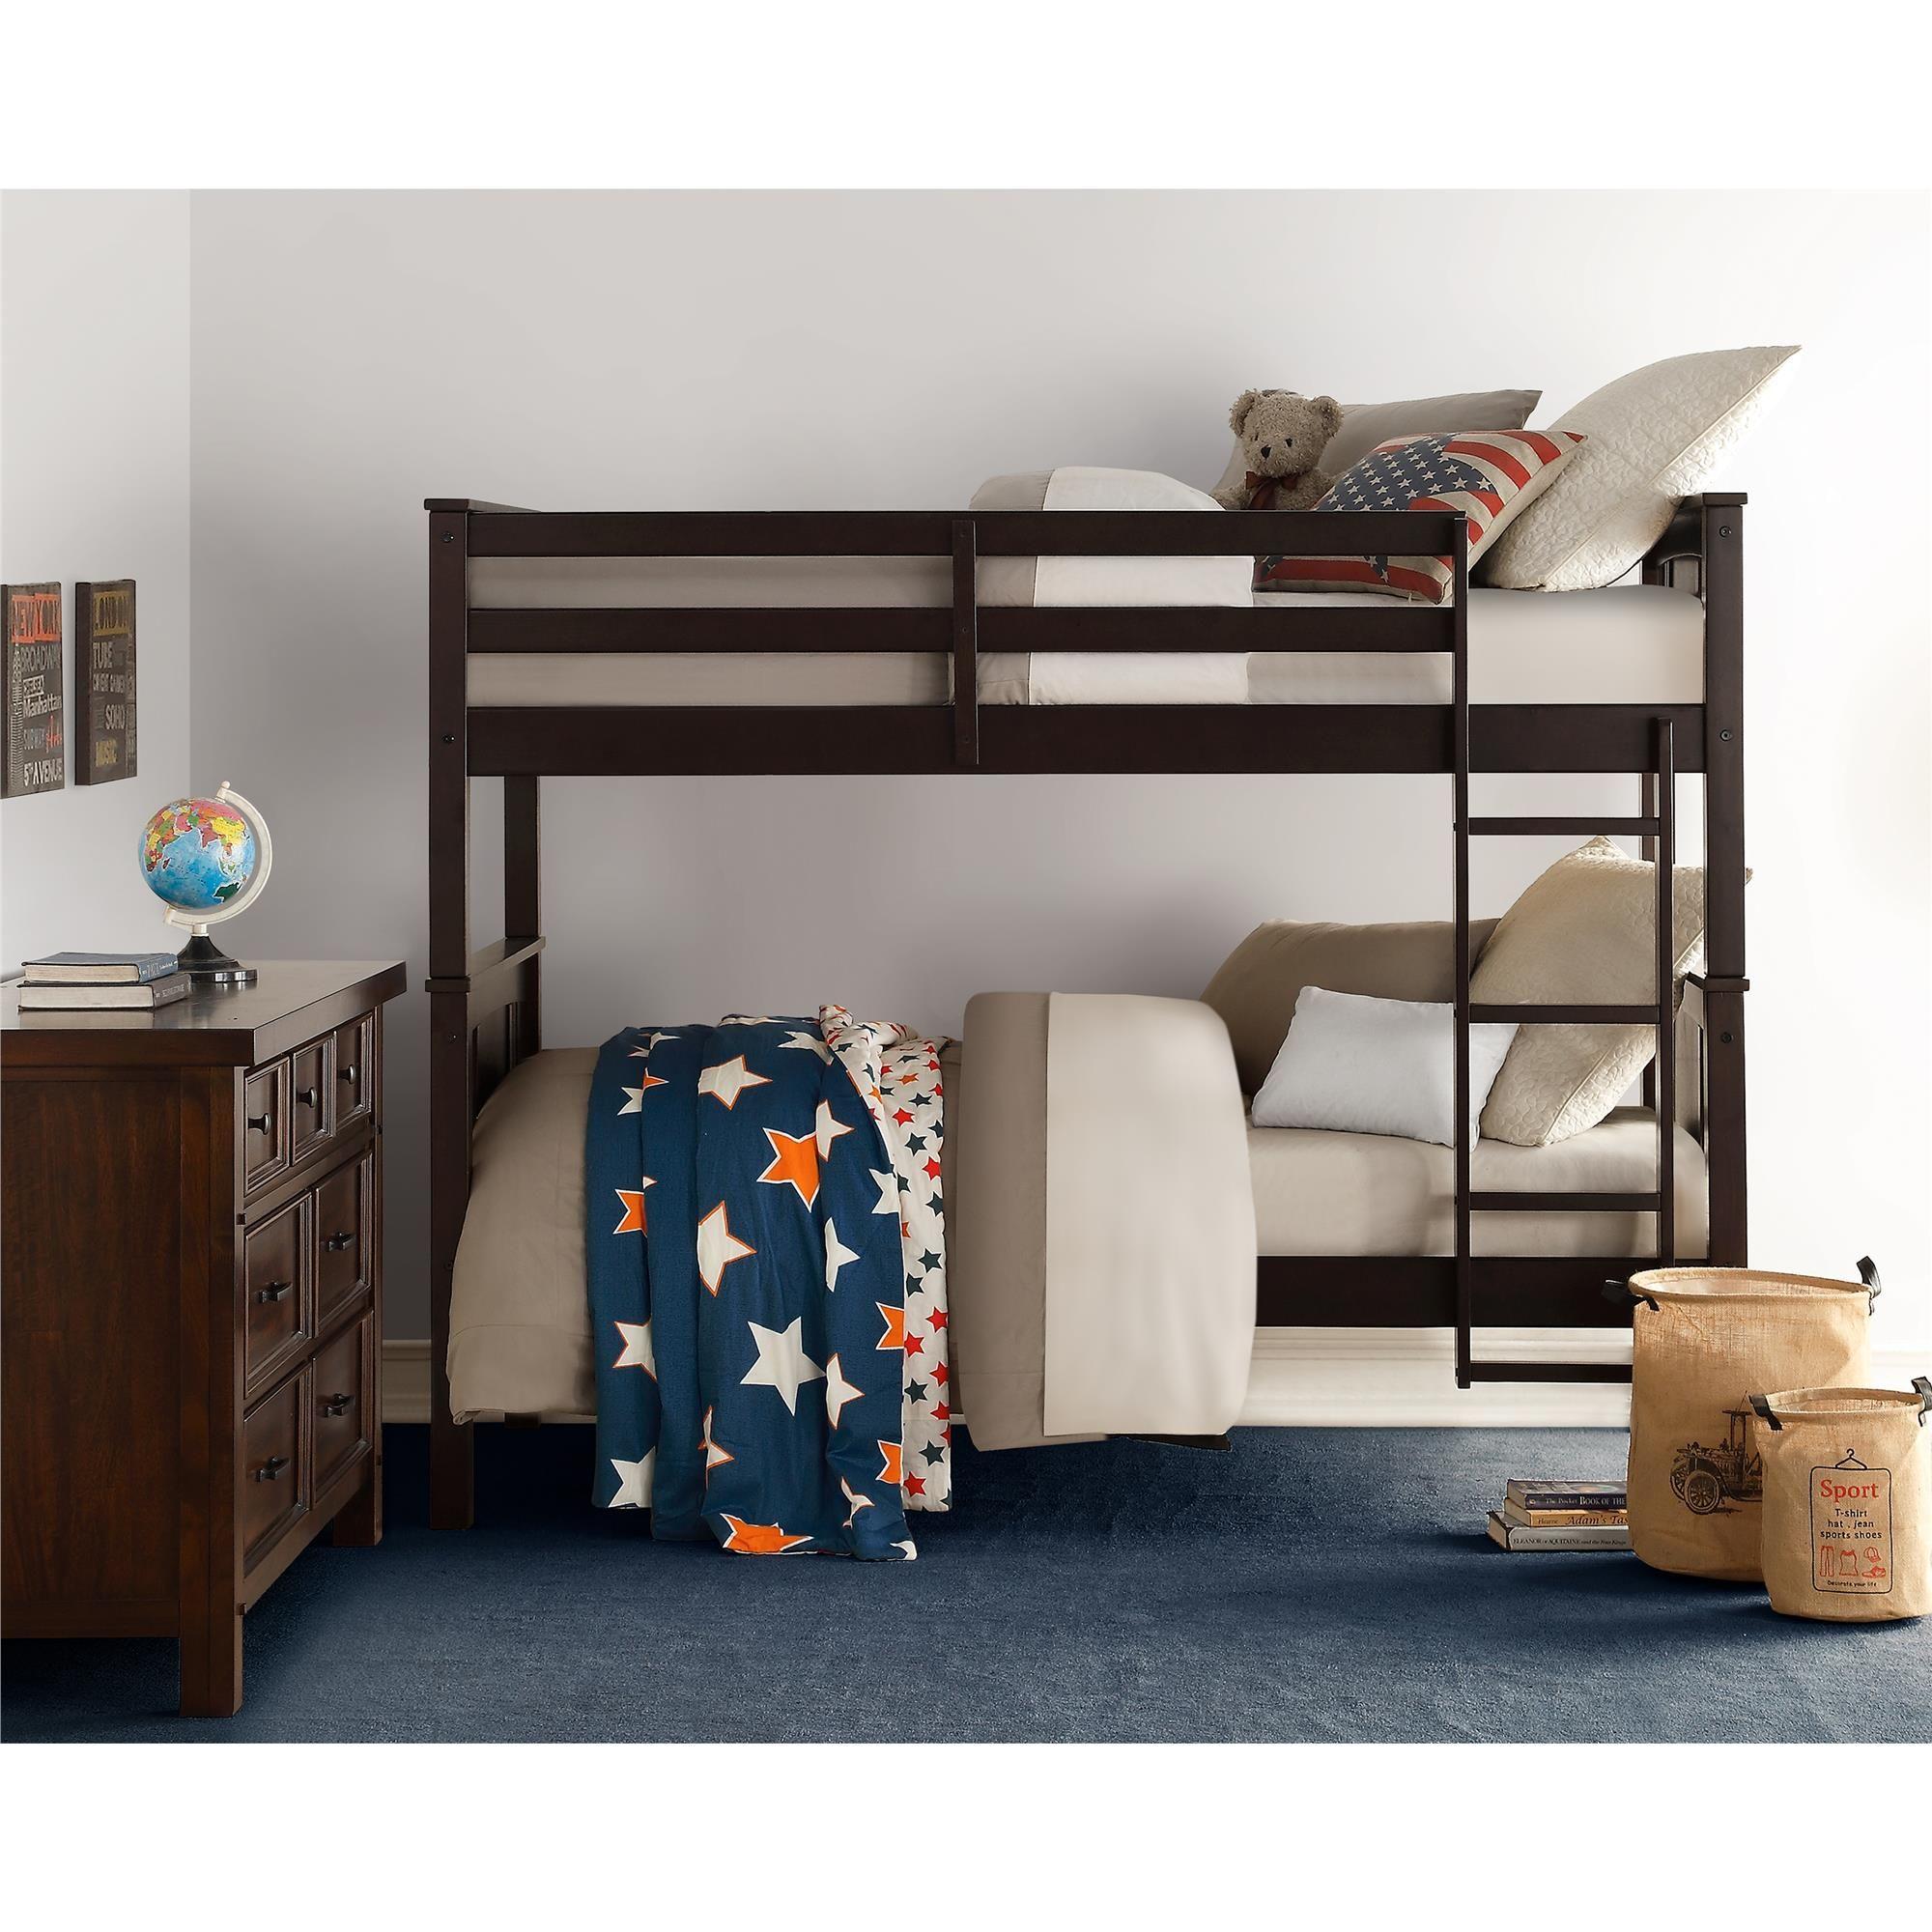 s junior loft childs kids itm bunk ladder childrens twin bed metal rails child toddler